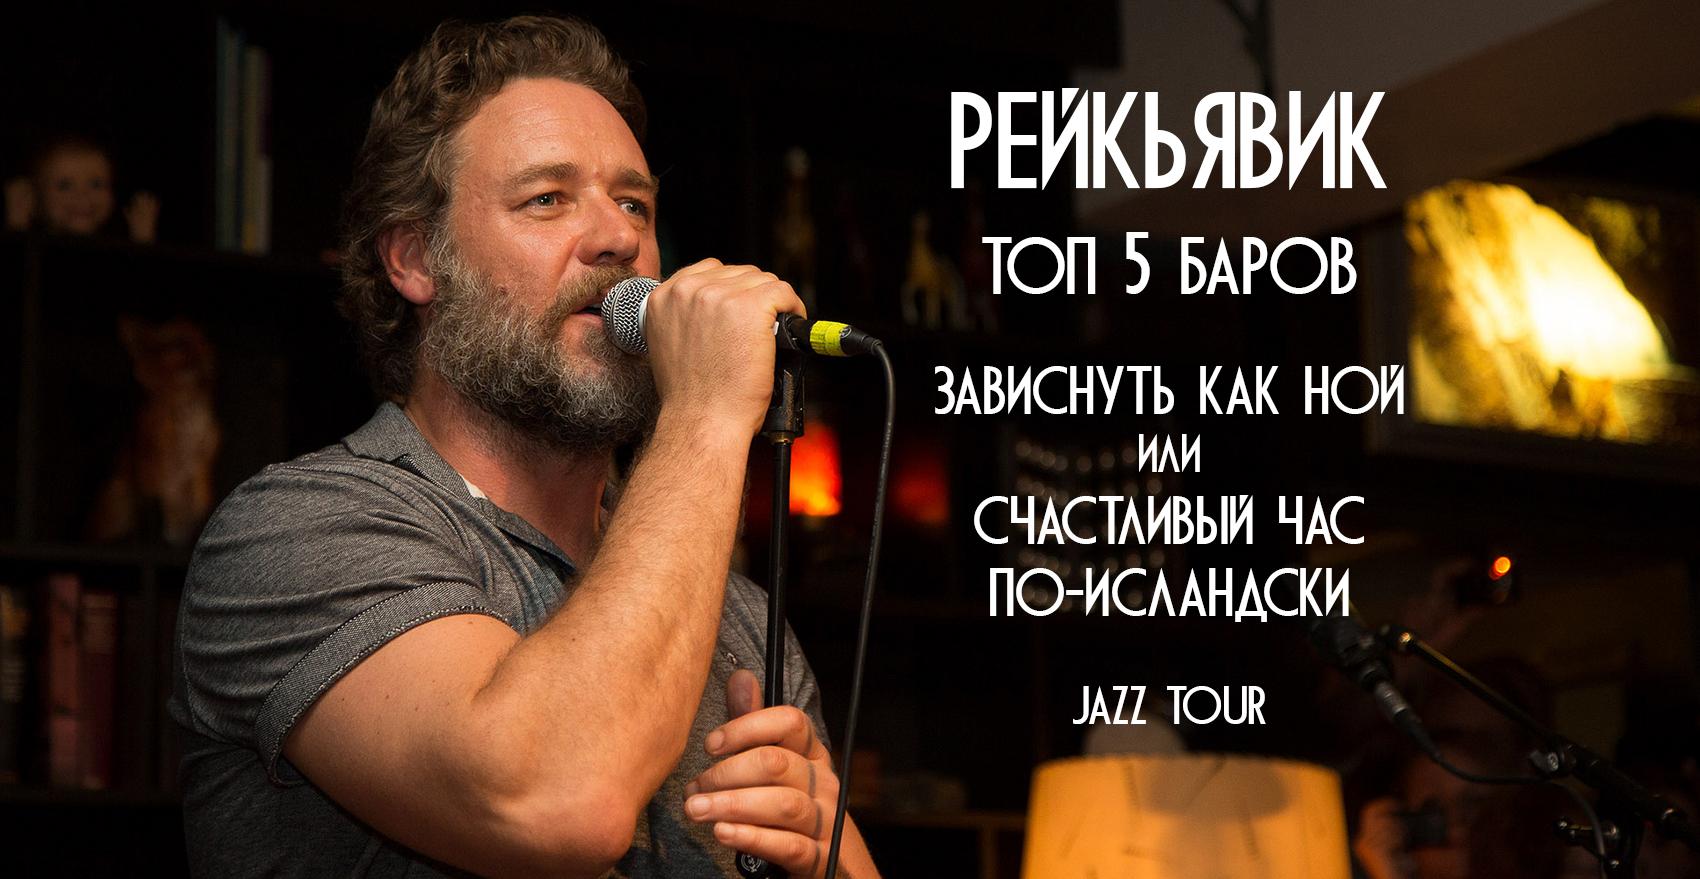 Reykjavik-Jazztour